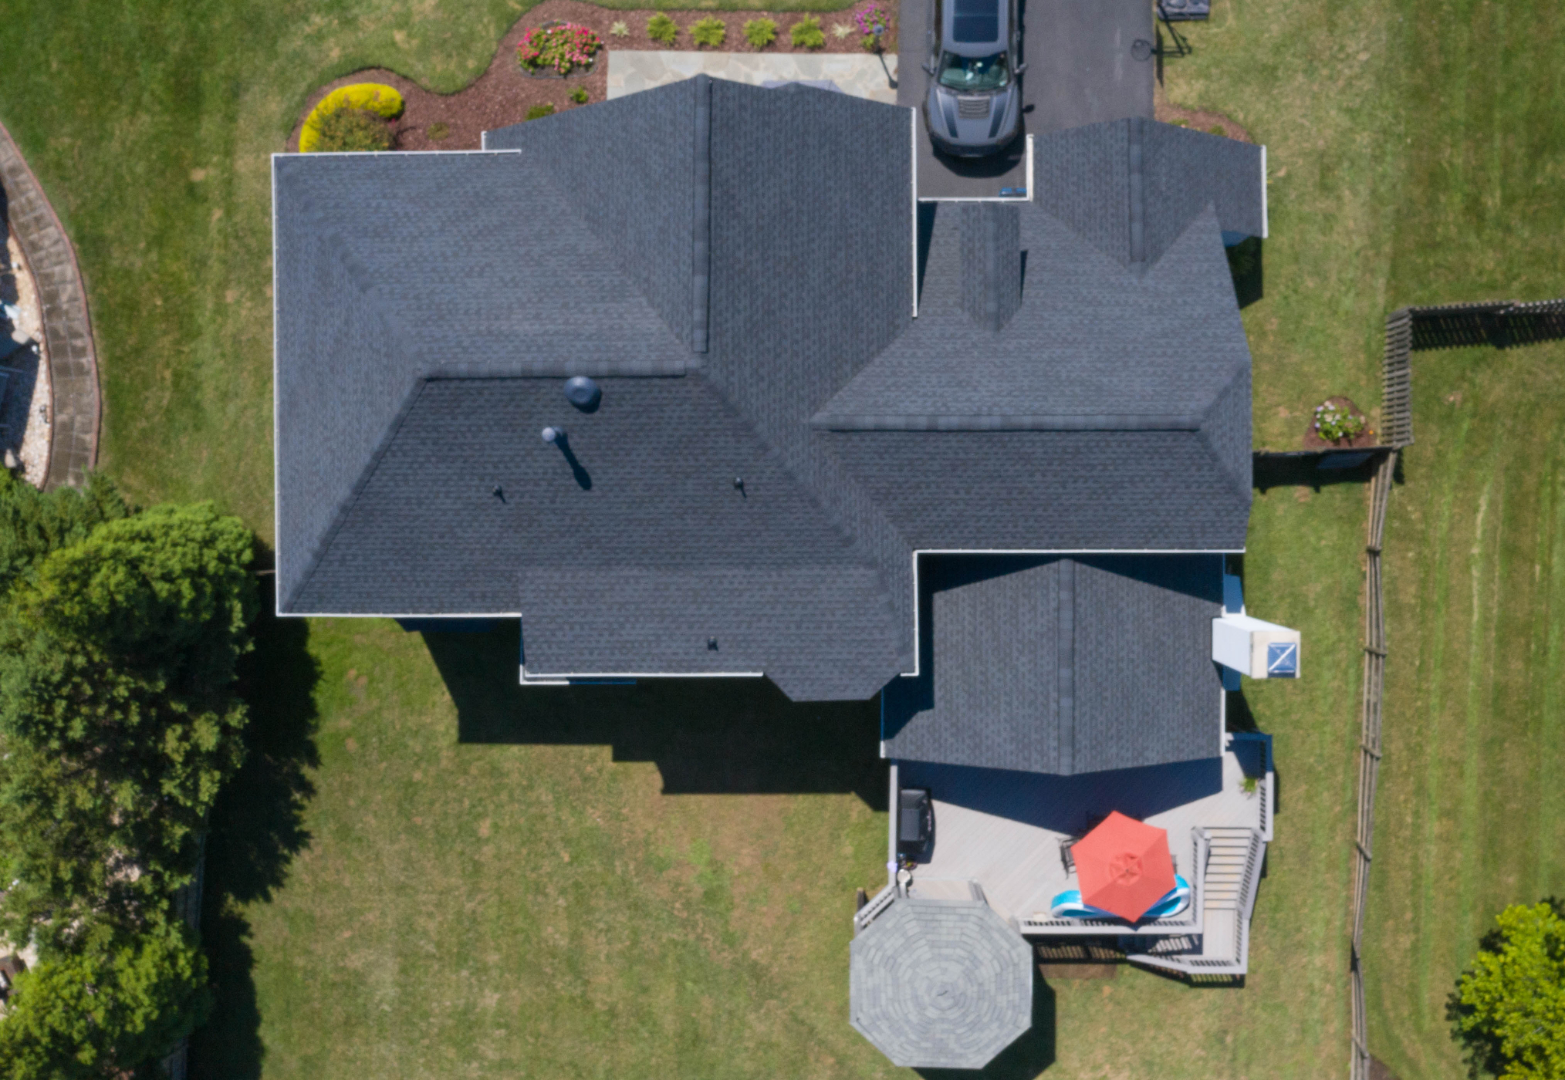 SmartRoof - Residential, Commercial Pike Creek DE Roofing Contractors